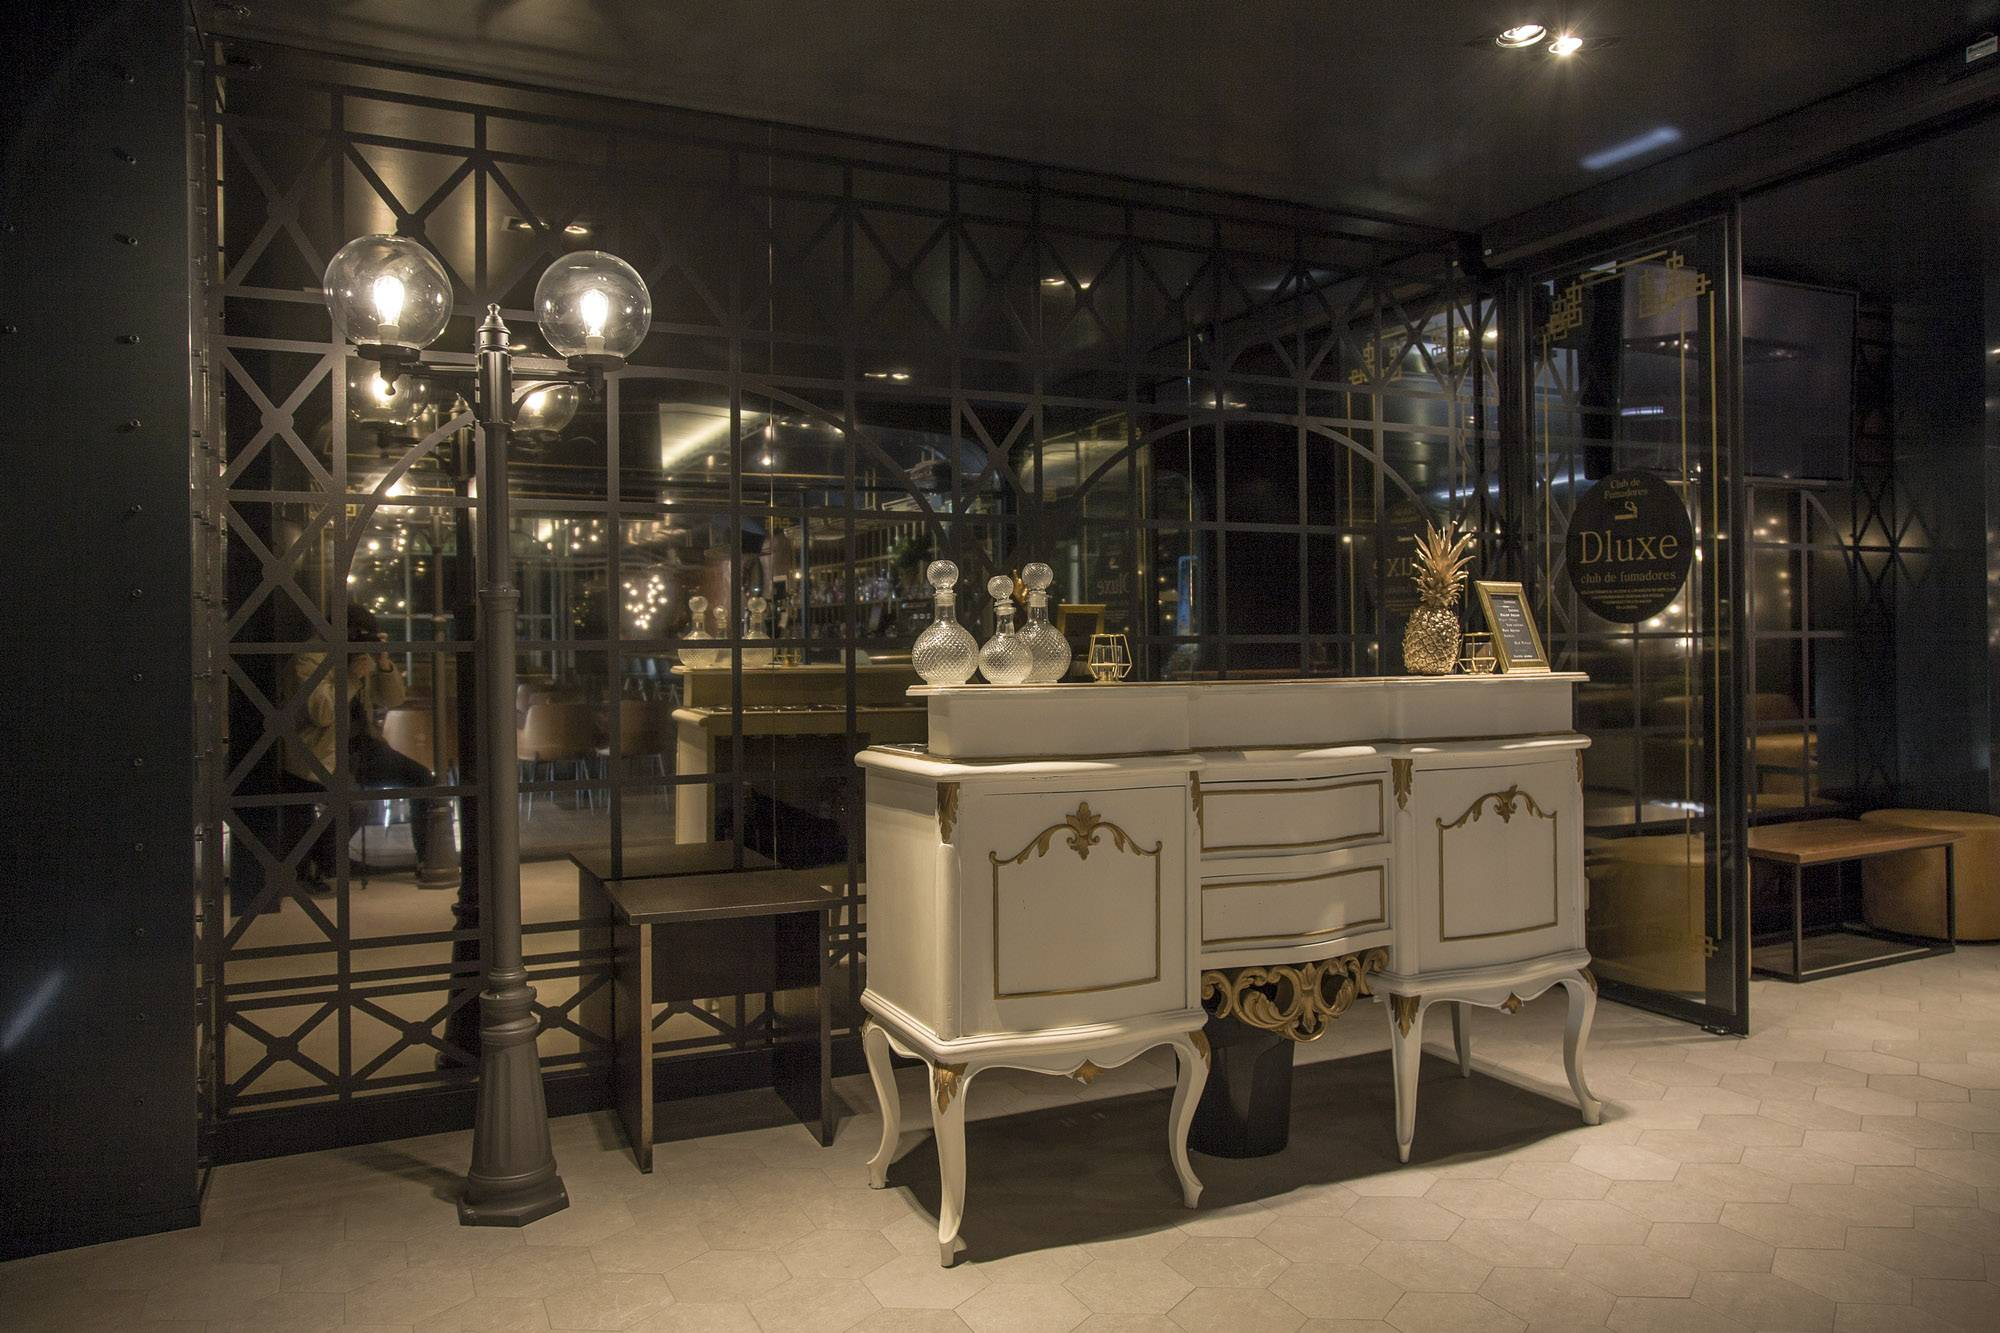 interiorismo mobiliario decoracion dluxe rosa lopez1